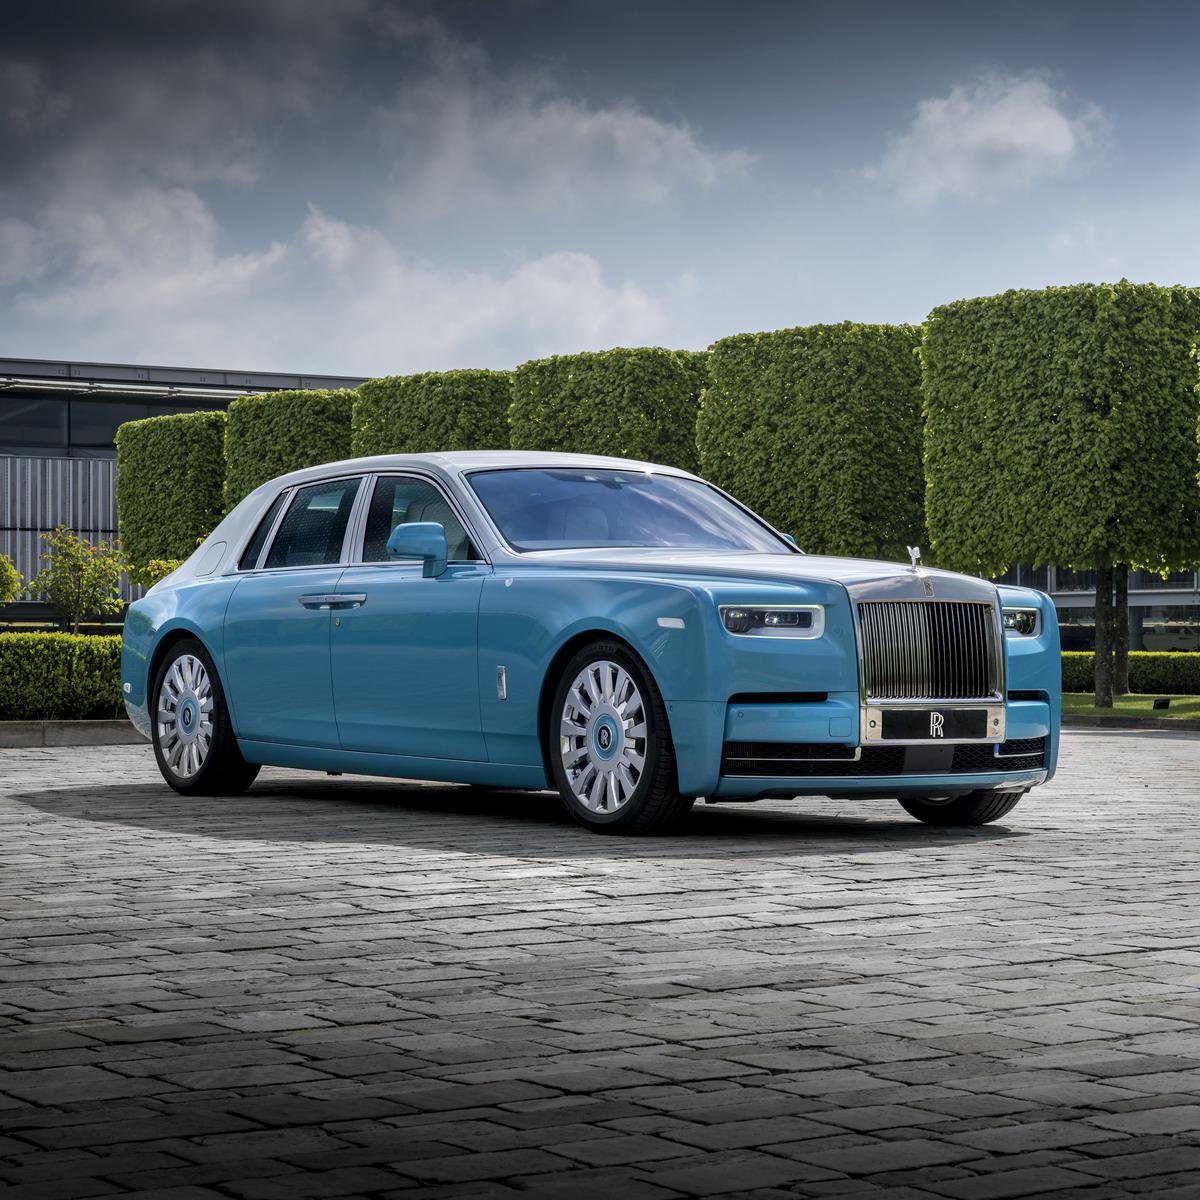 Global demand for bespoke Rolls Royce models increases 4